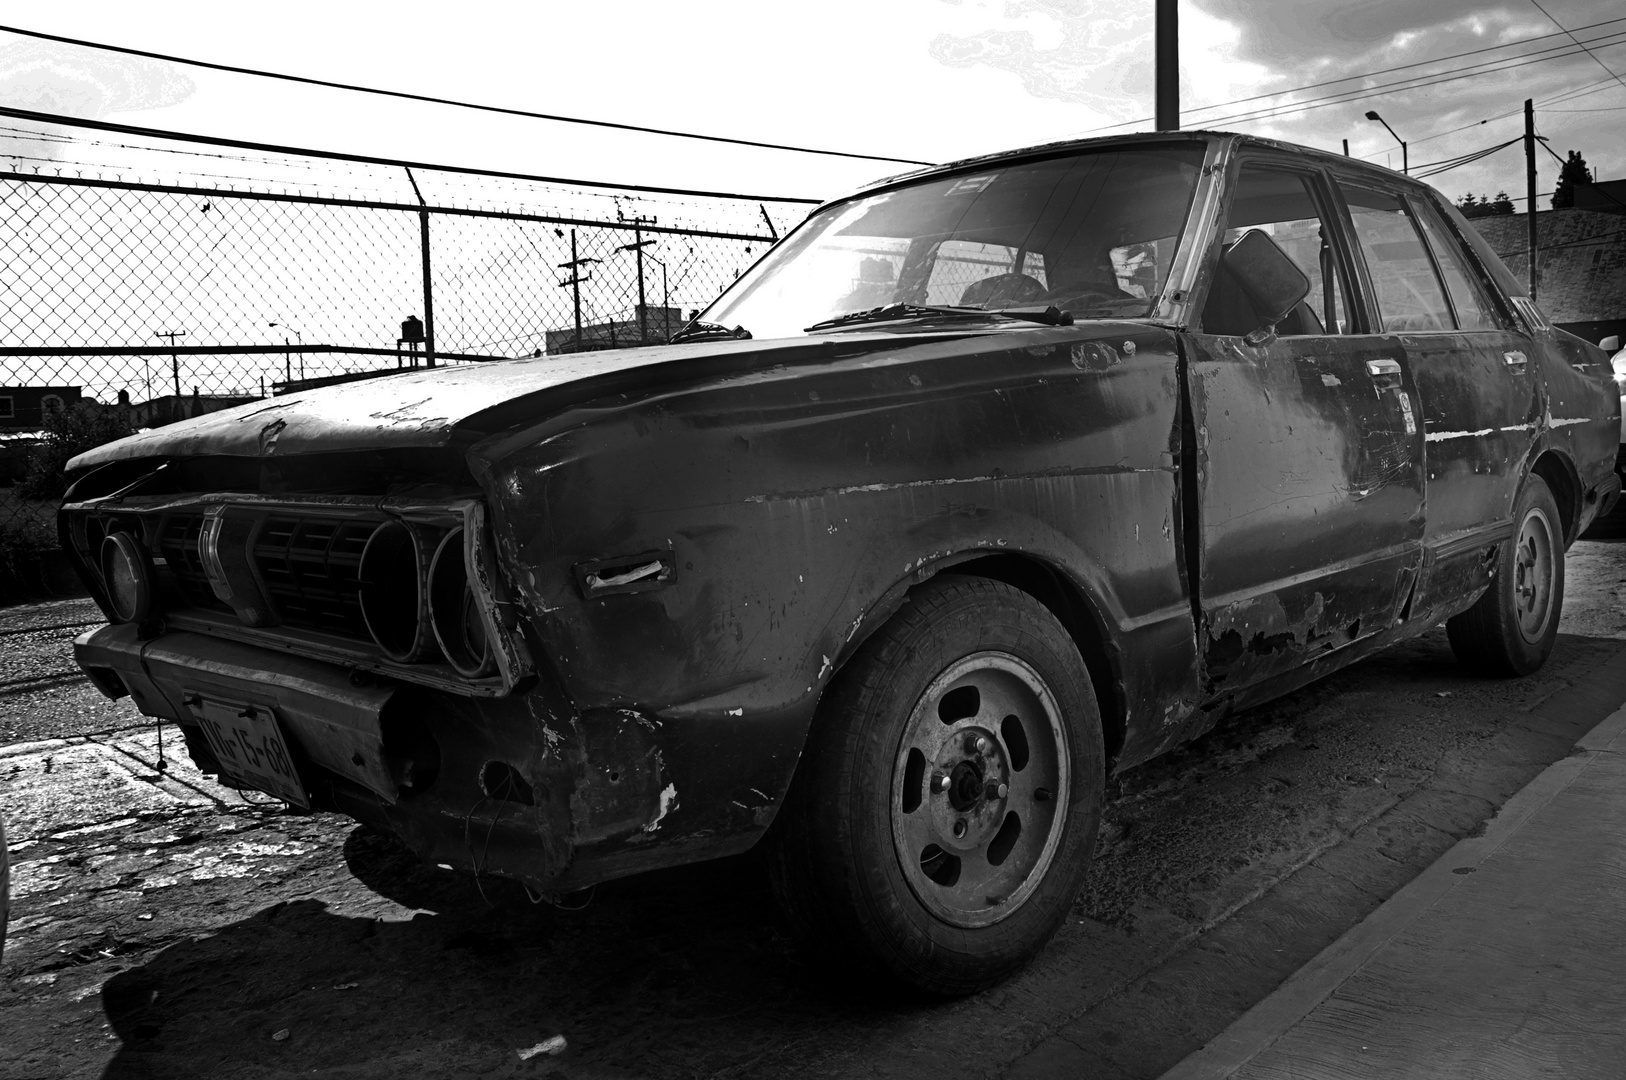 Straßenleben in Mexiko